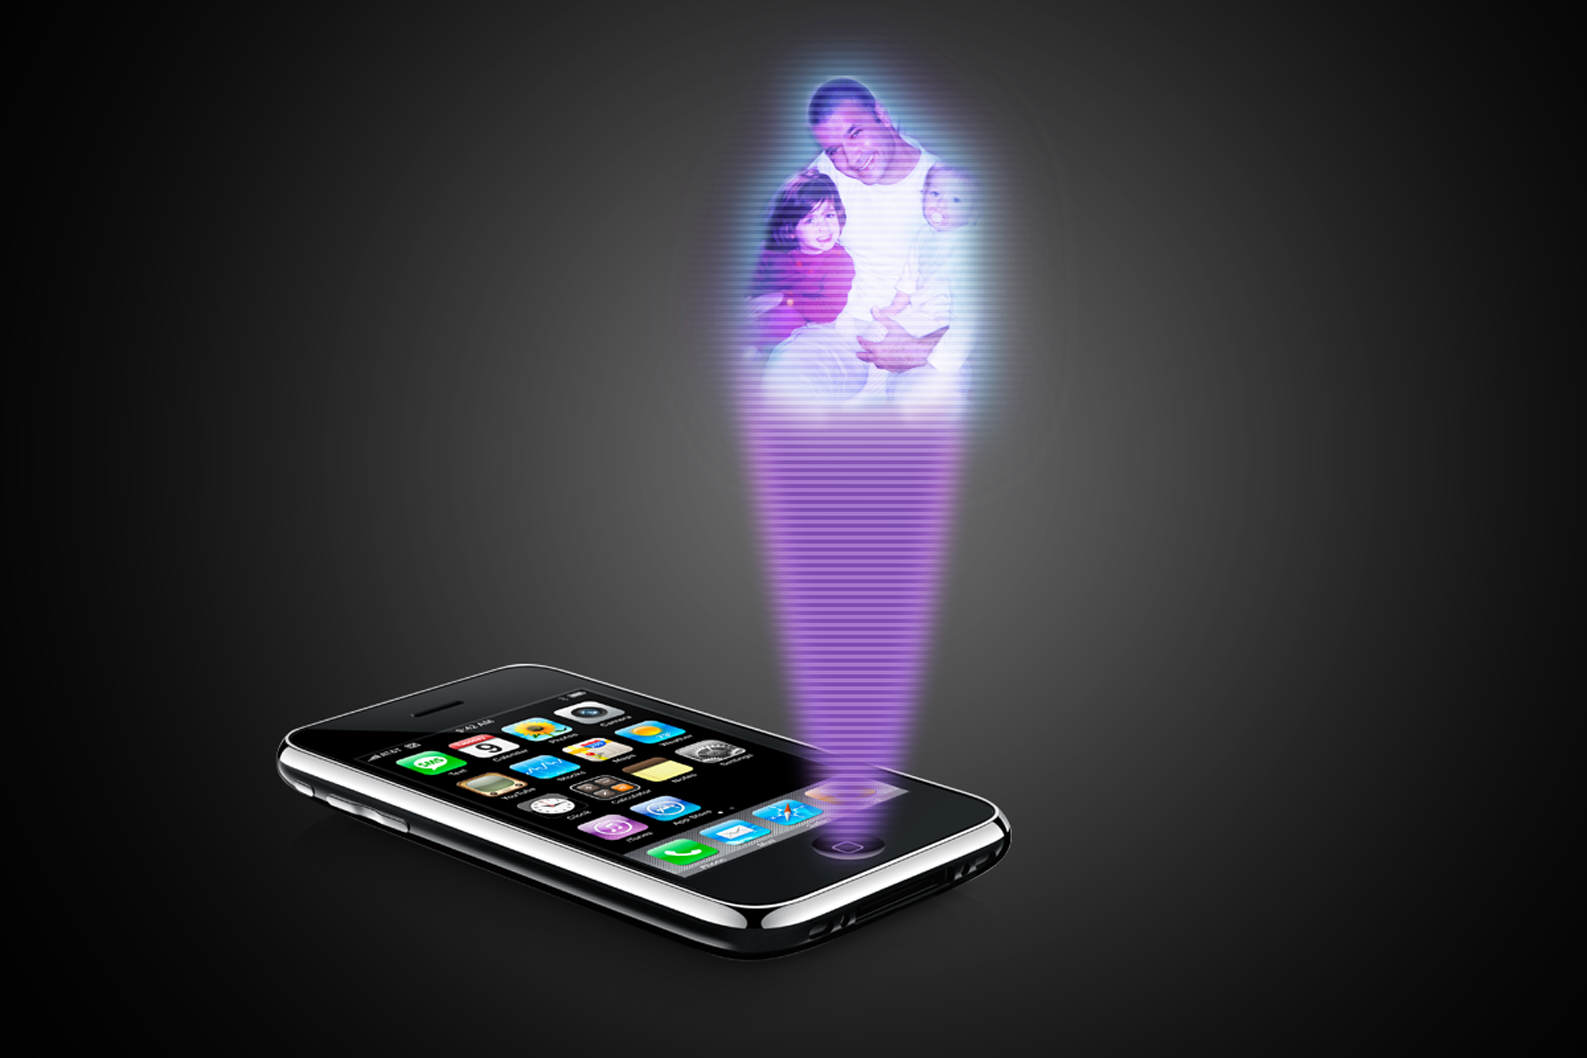 Dijital Dünyada Hologram'a Akıllı Telefon Perspektifinden Bakmak